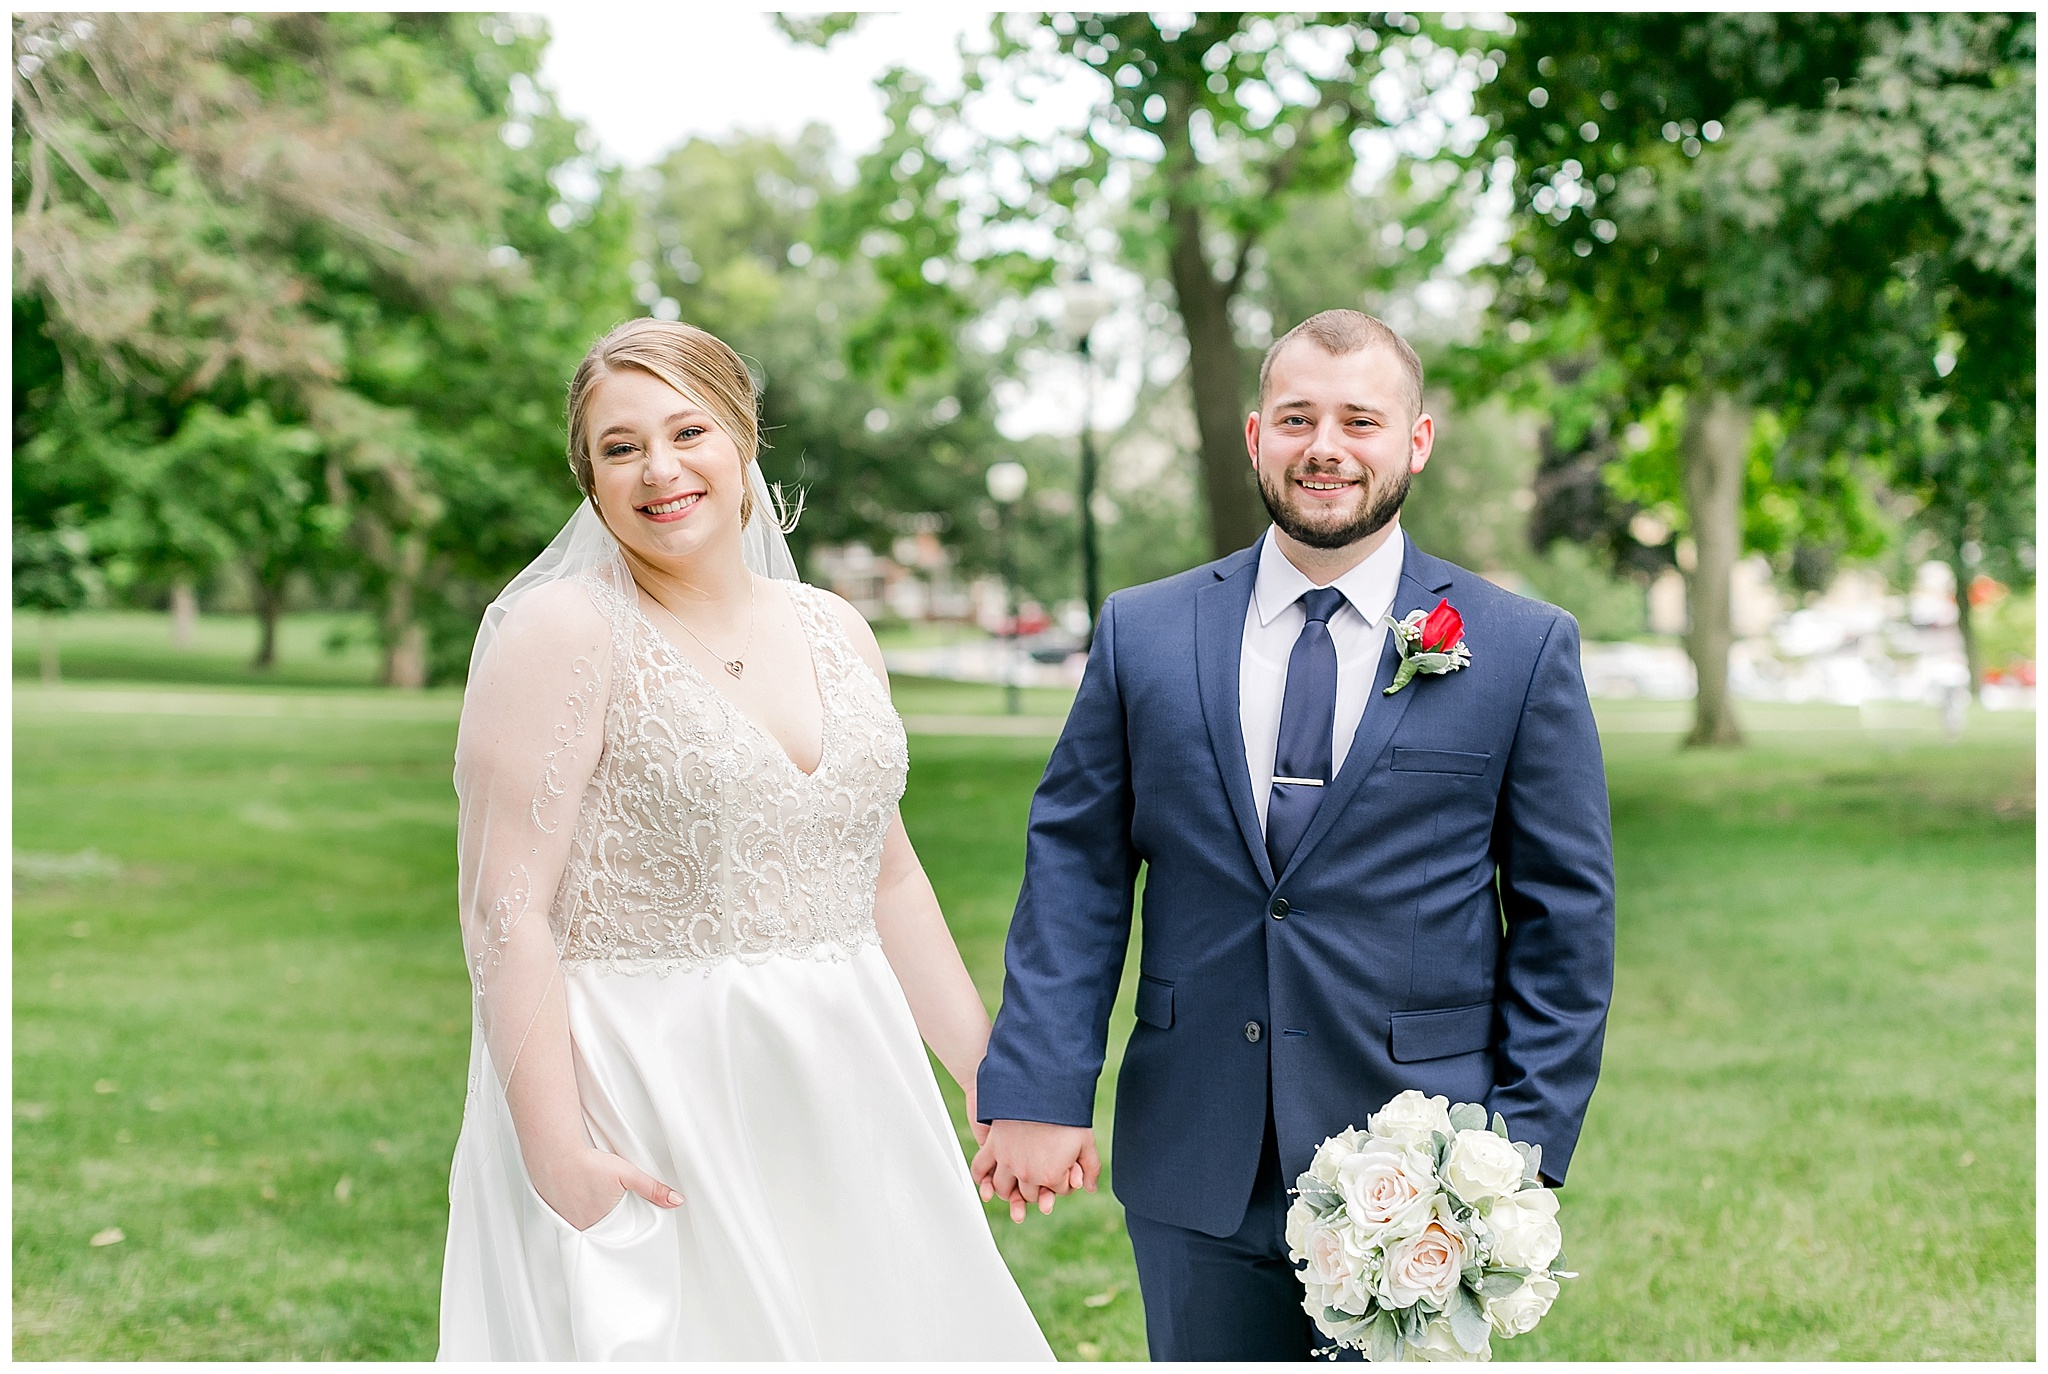 la_casa_grande_wedding_beloit_wisconsin_caynay_photo_0035.jpg